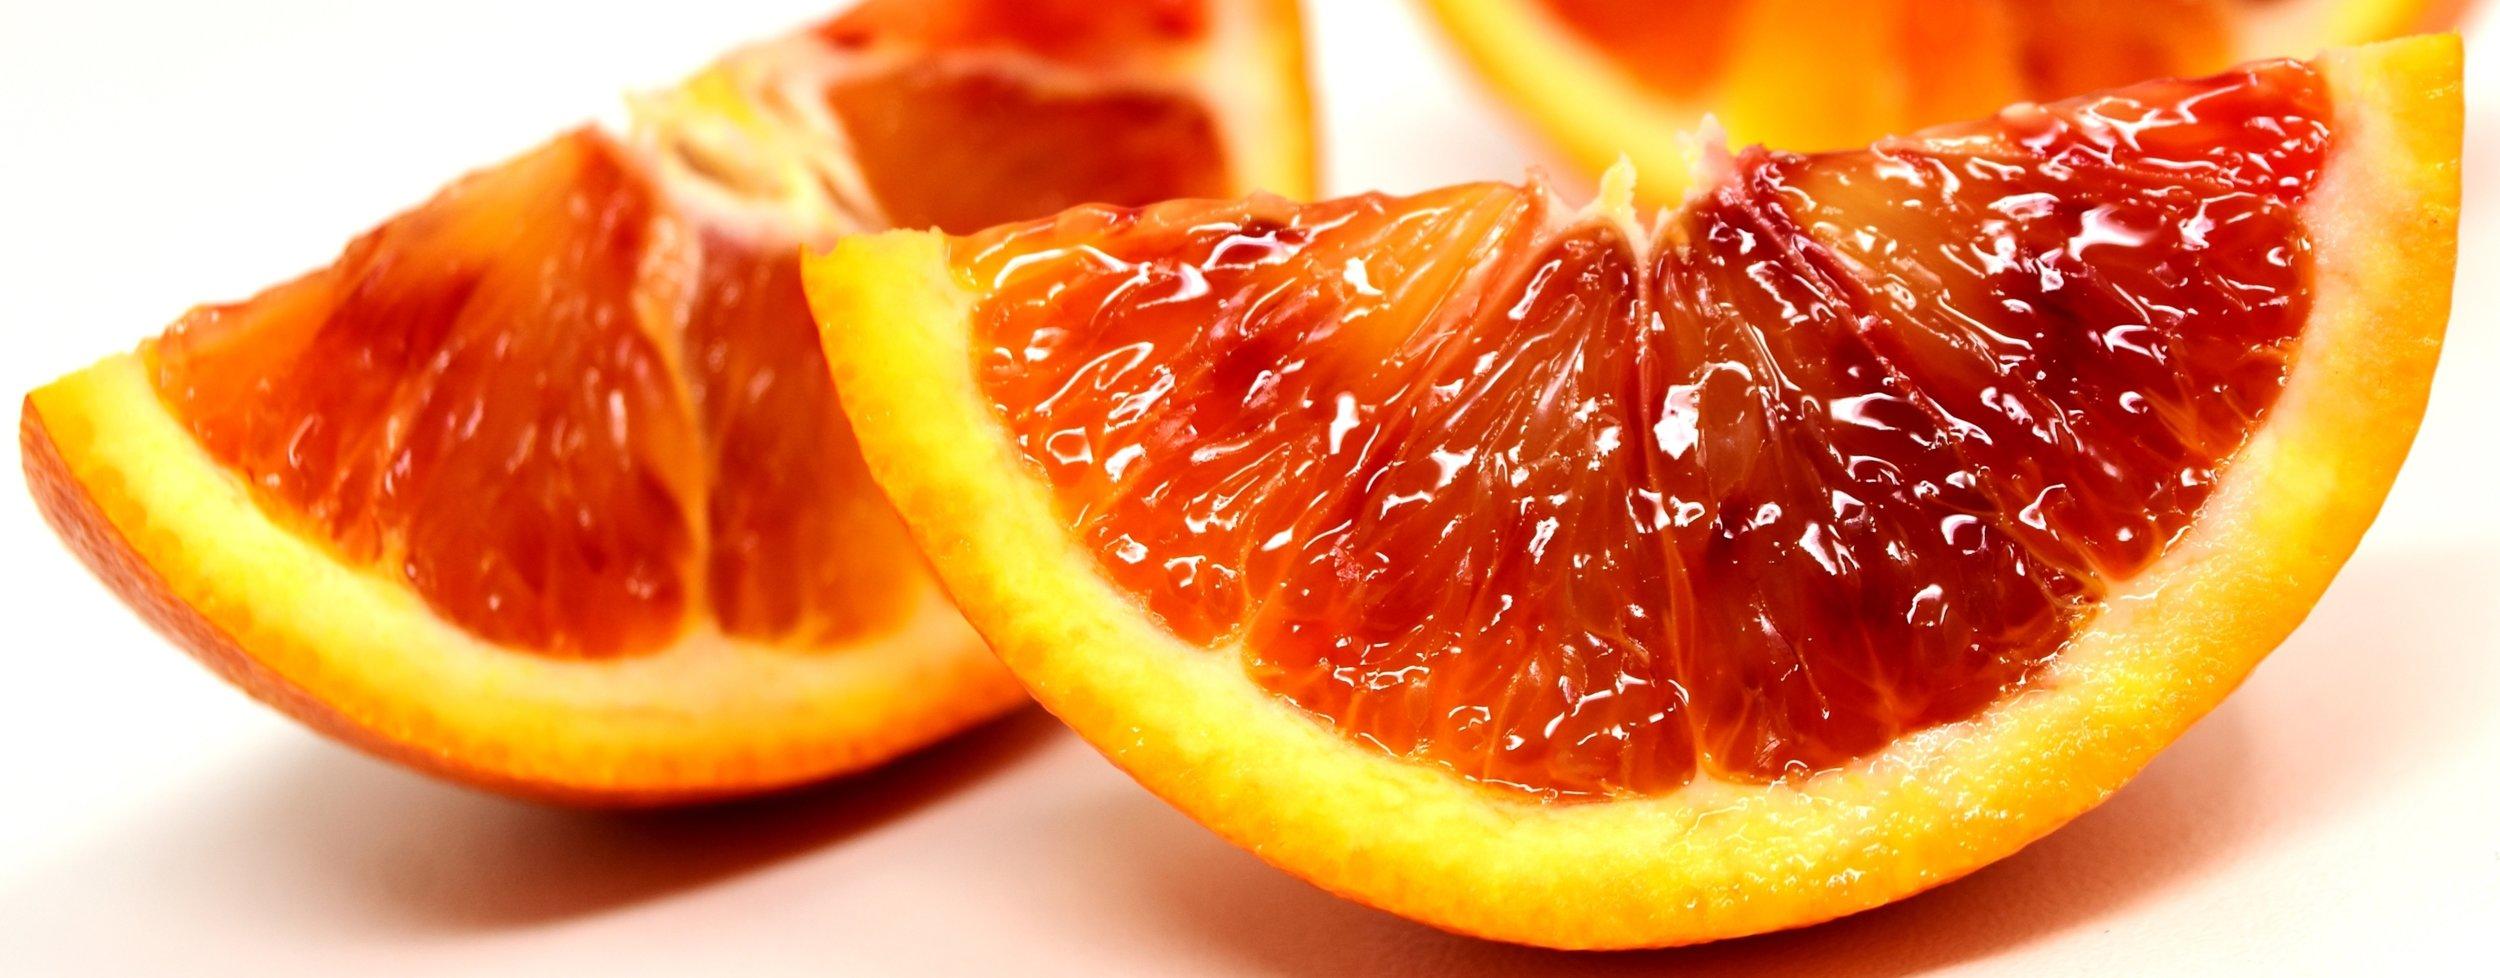 865 Candle Company - Blood Orange